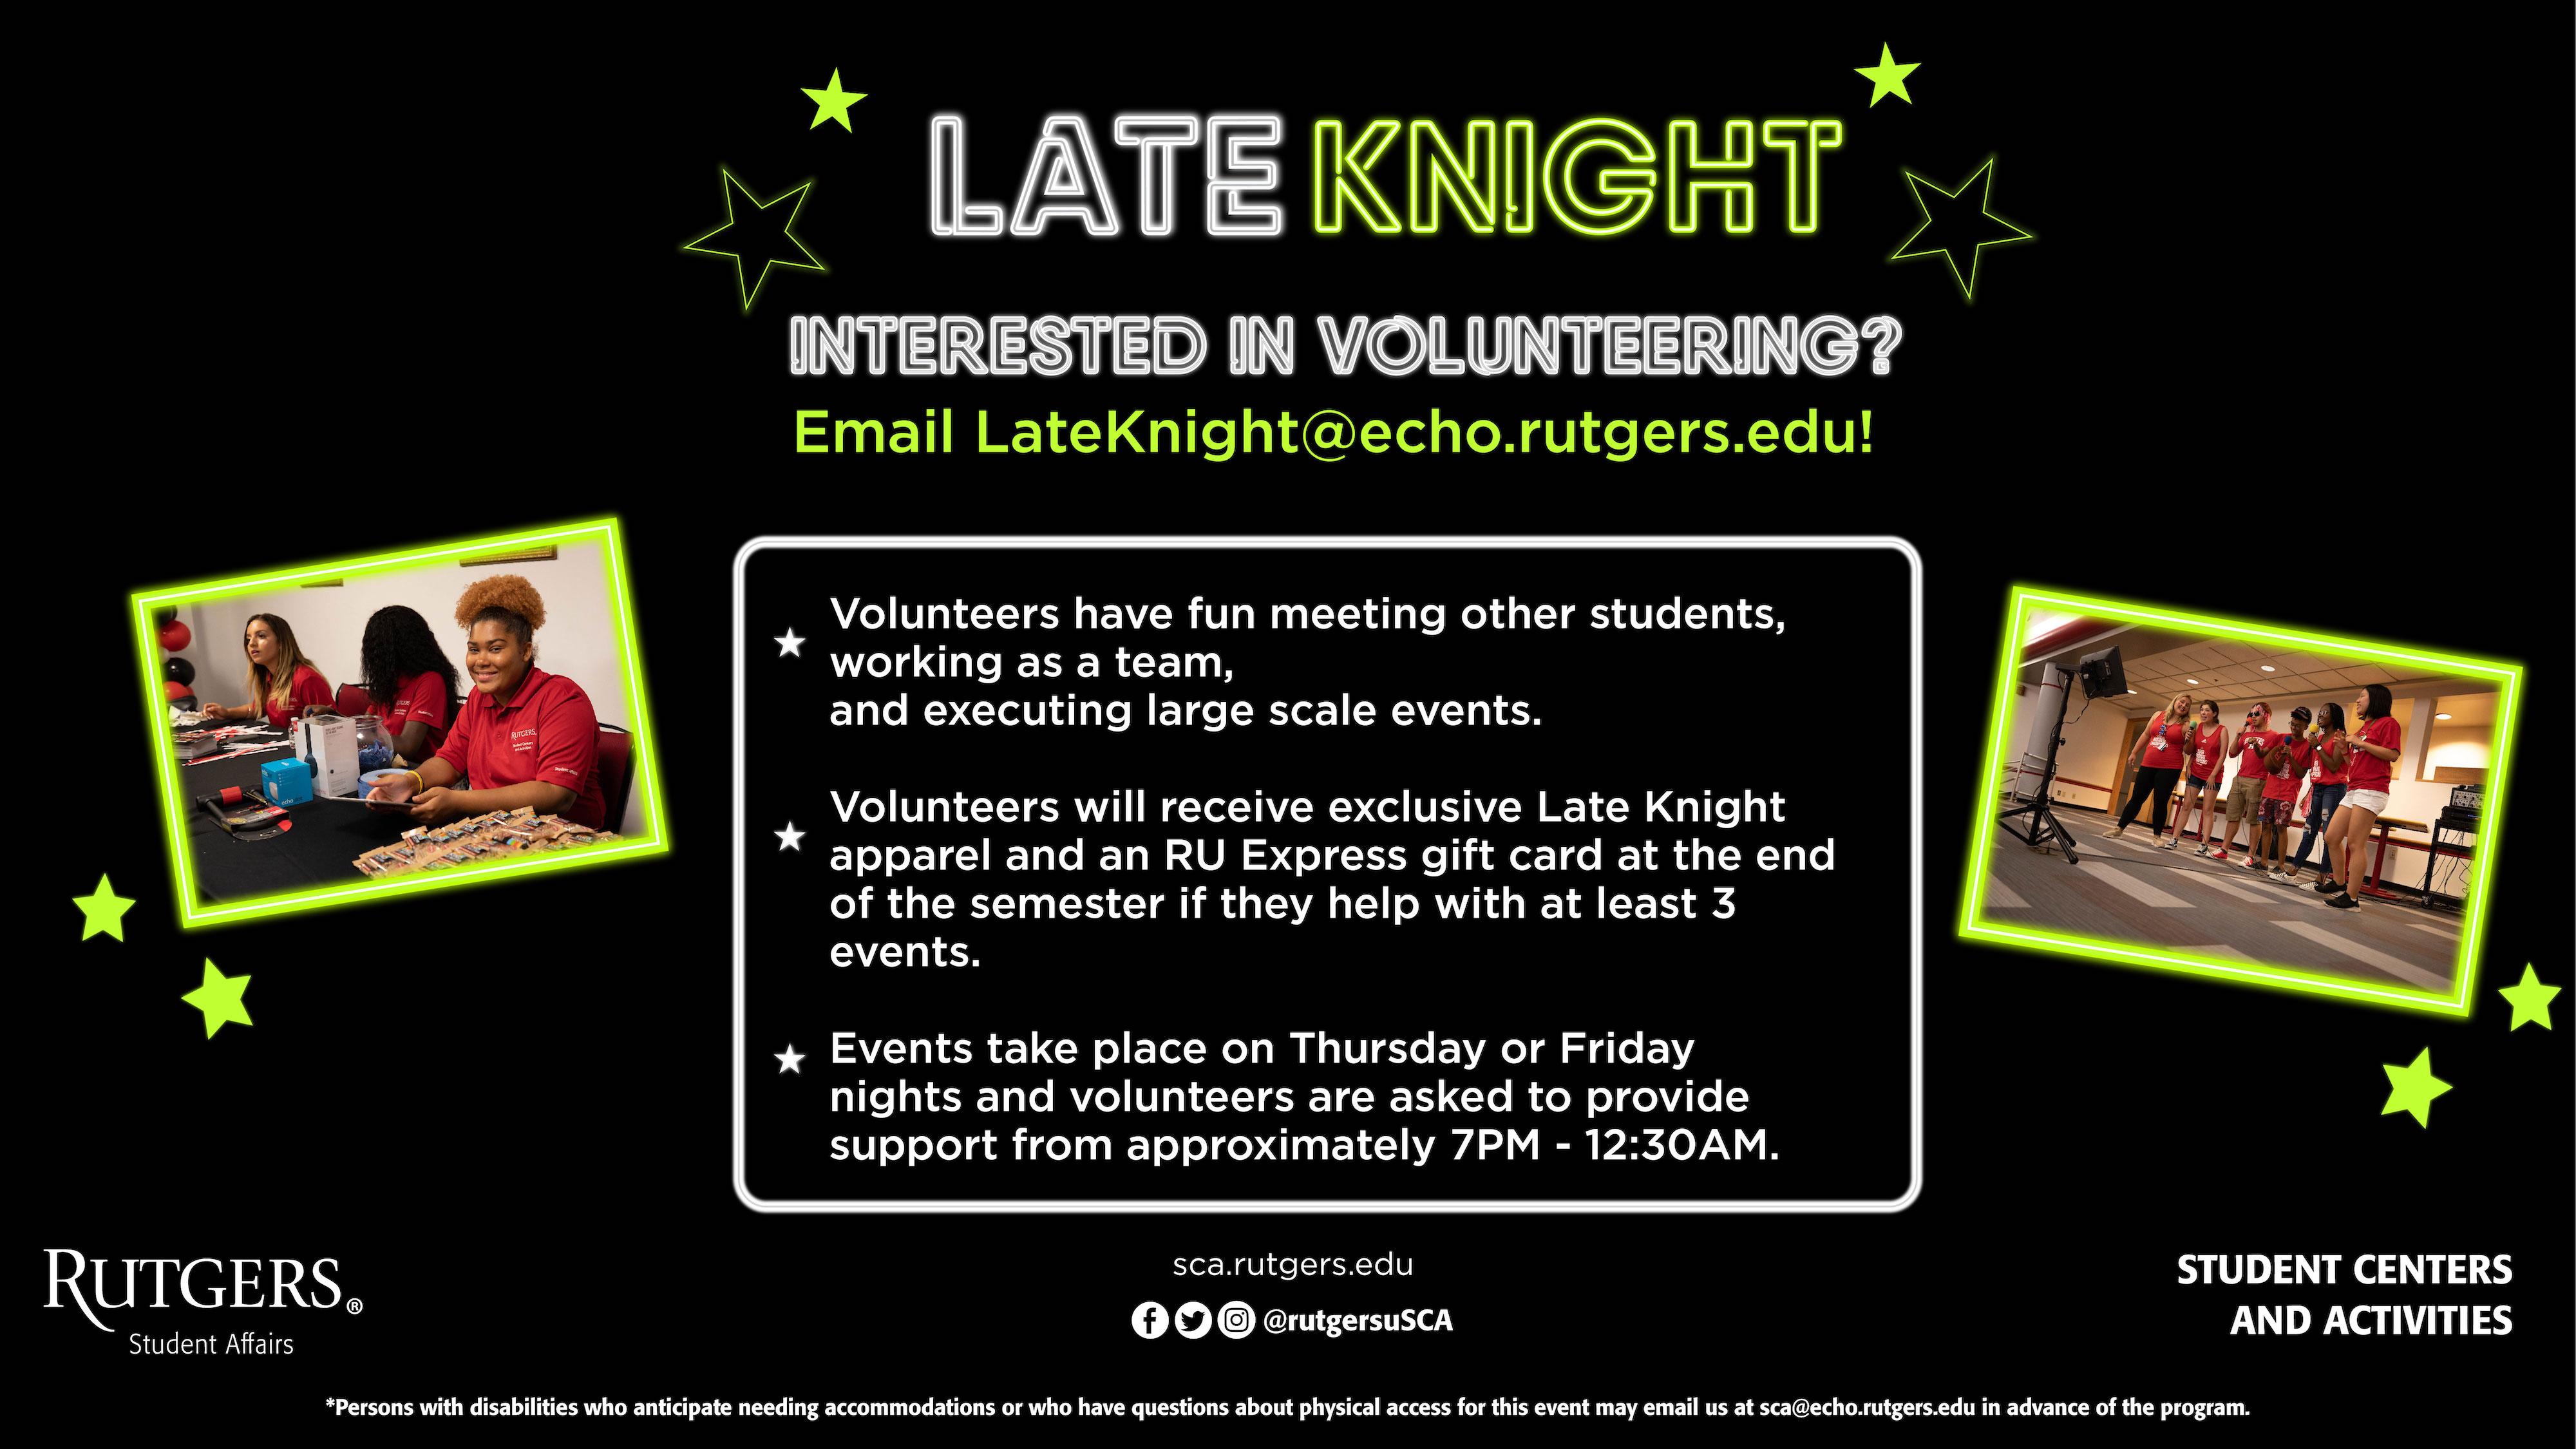 Late Knight Volunteering